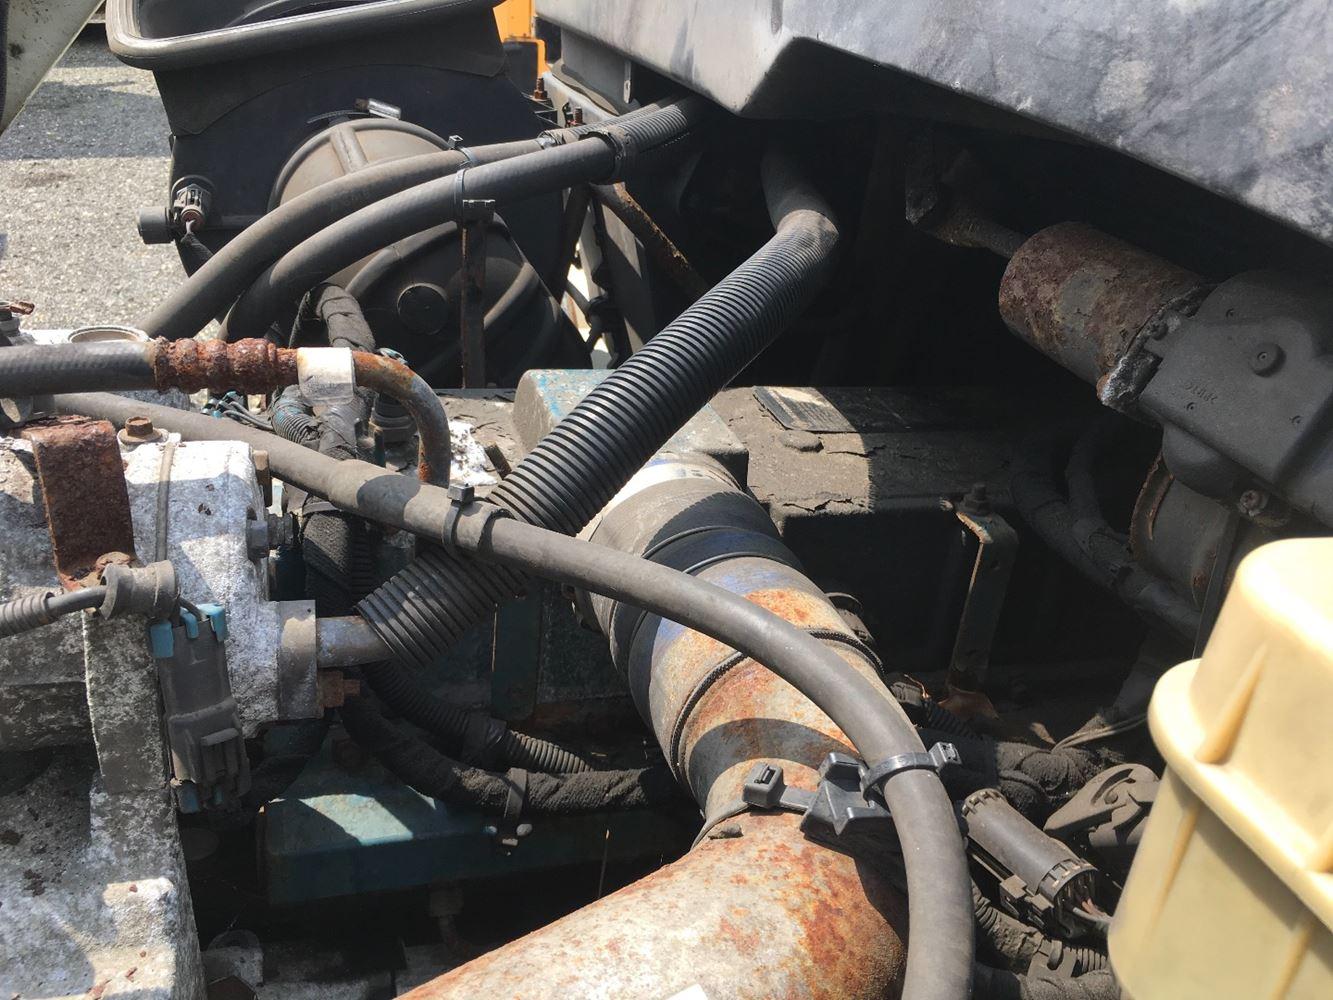 2002 INTERNATIONAL DT466E ENGINE ASSEMBLY TRUCK PARTS #680037